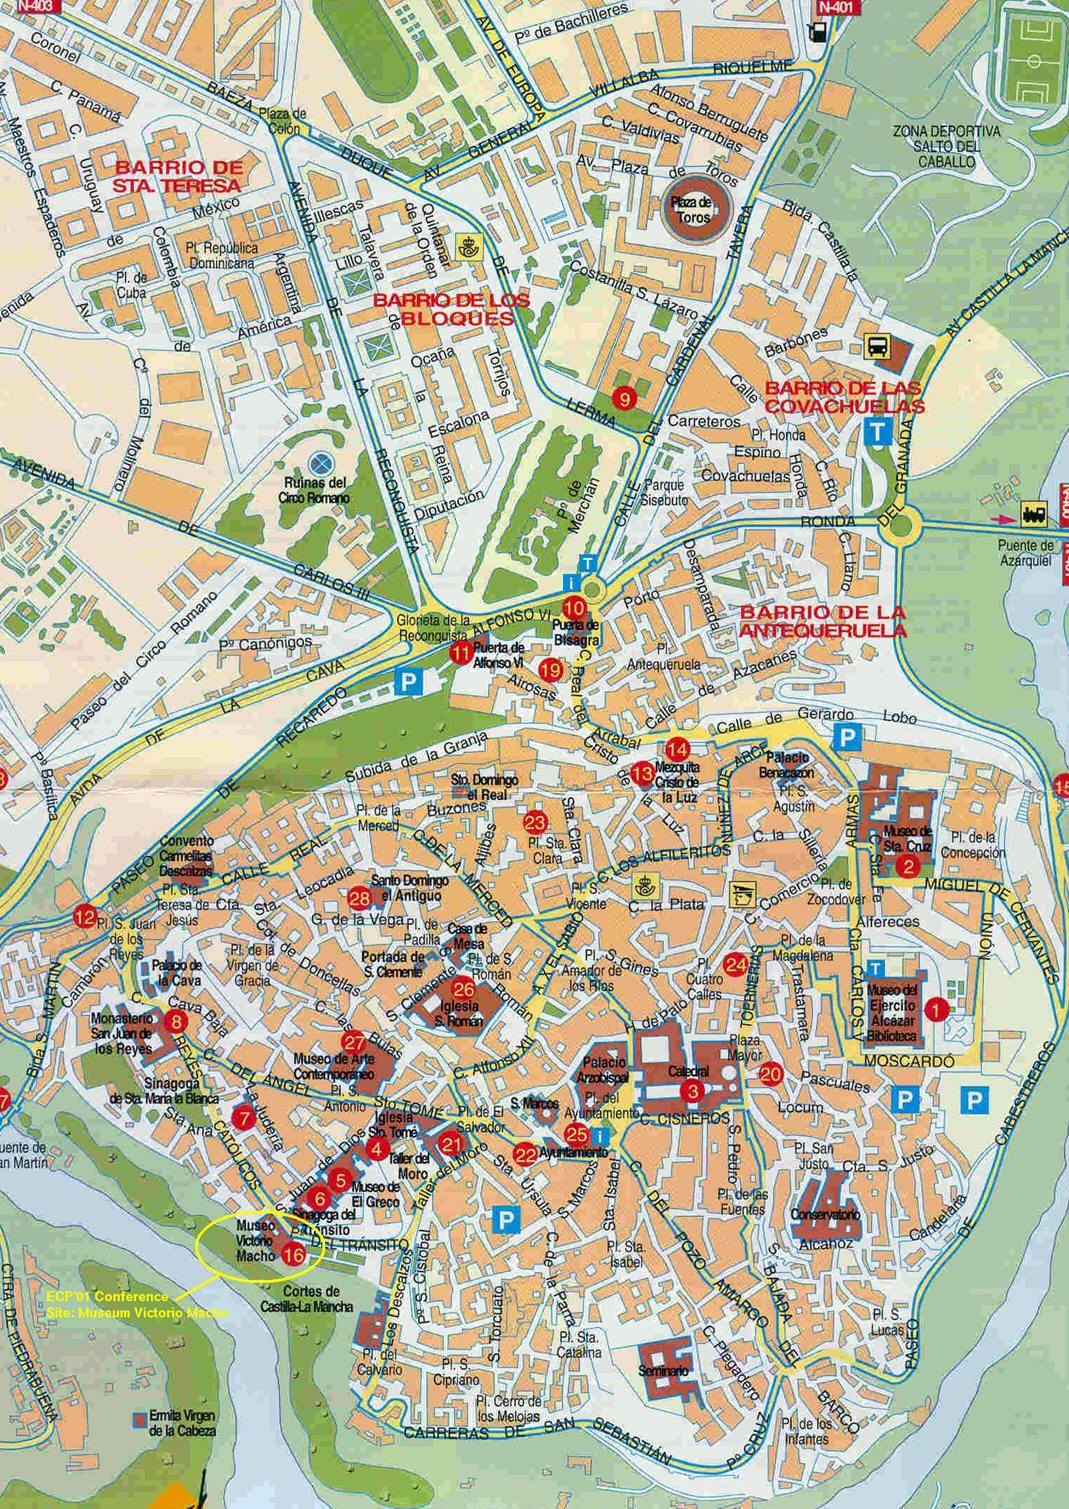 Cartina Citta Spagna.Mappa Toledo Cartina Di Toledo In Spagna Nel 2020 Mappe